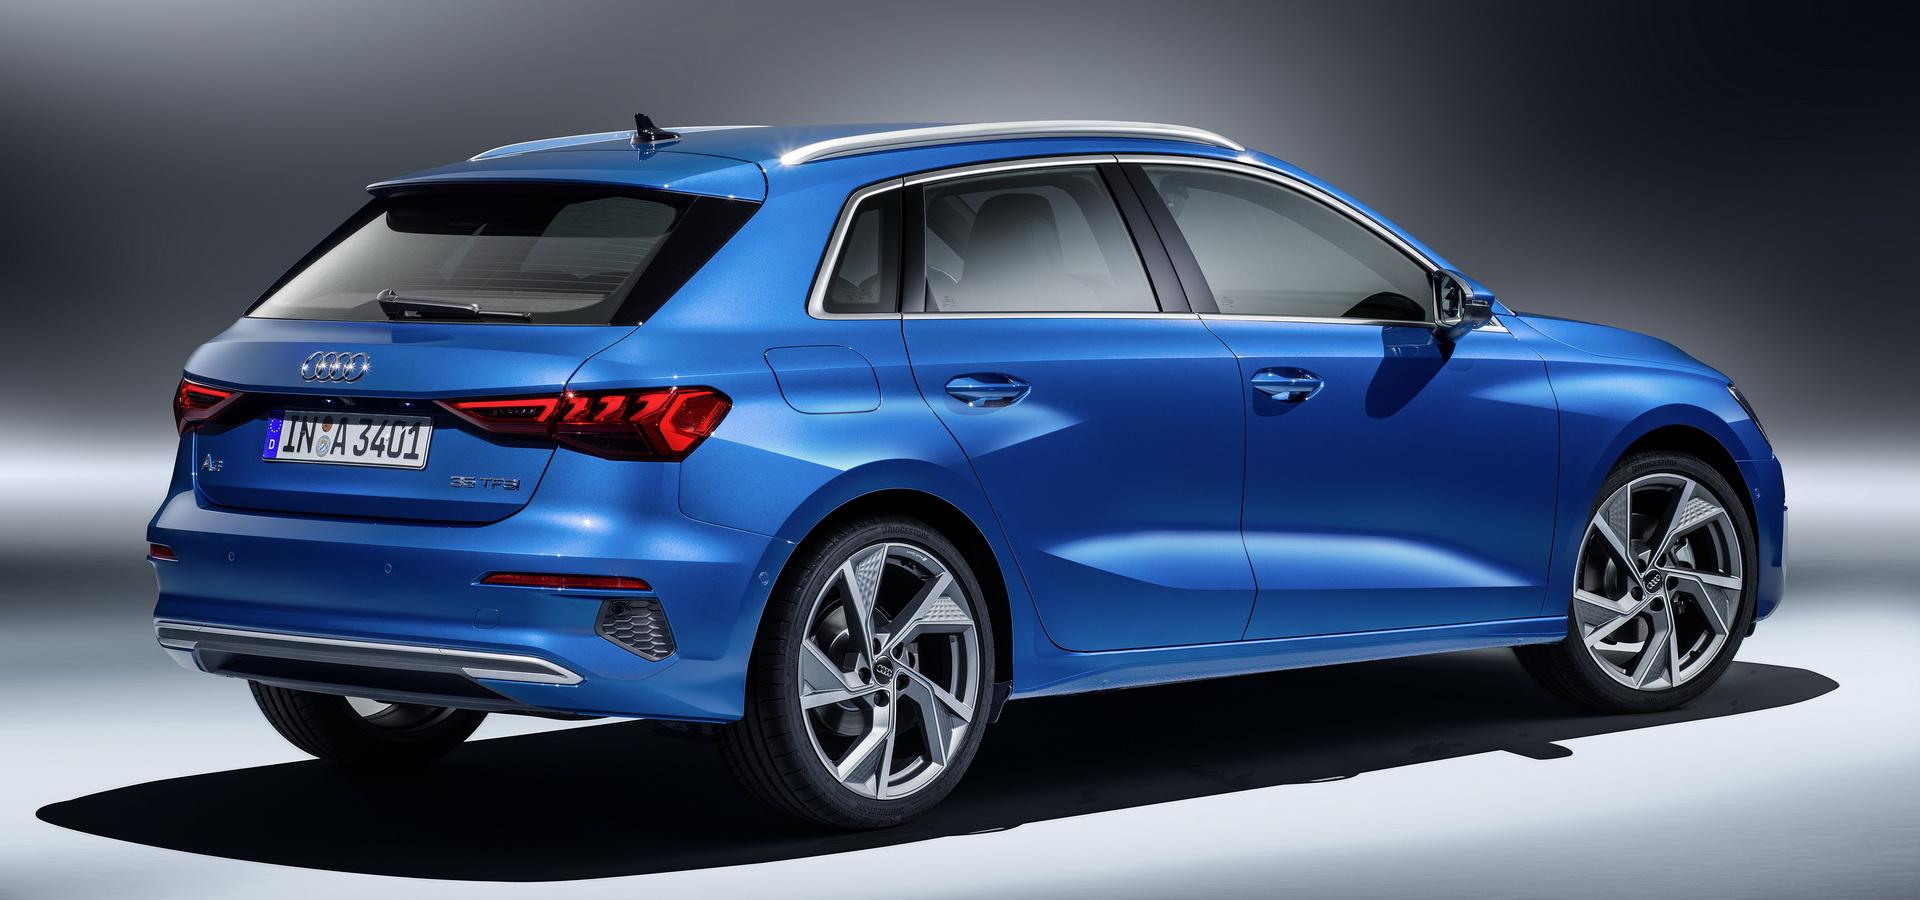 Audi A3 Sportback 2020 (5)